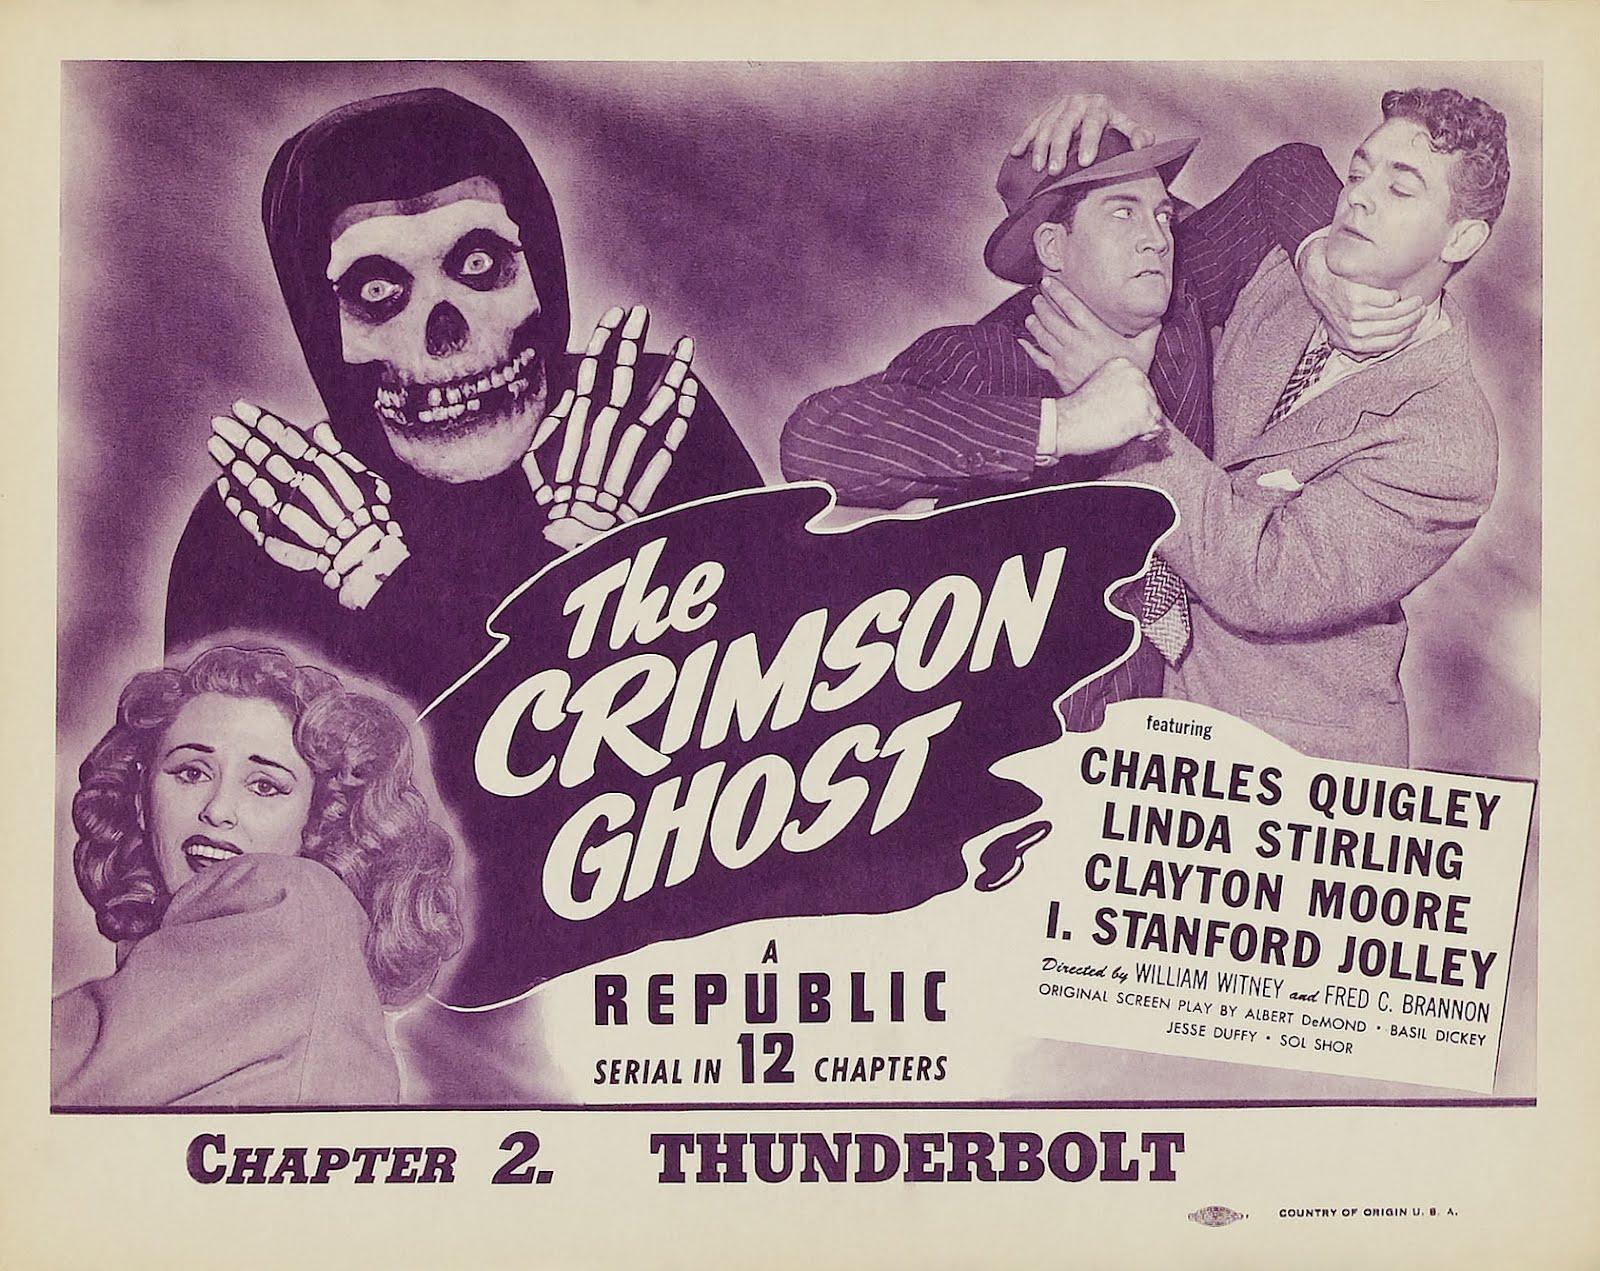 HMM crimson ghost